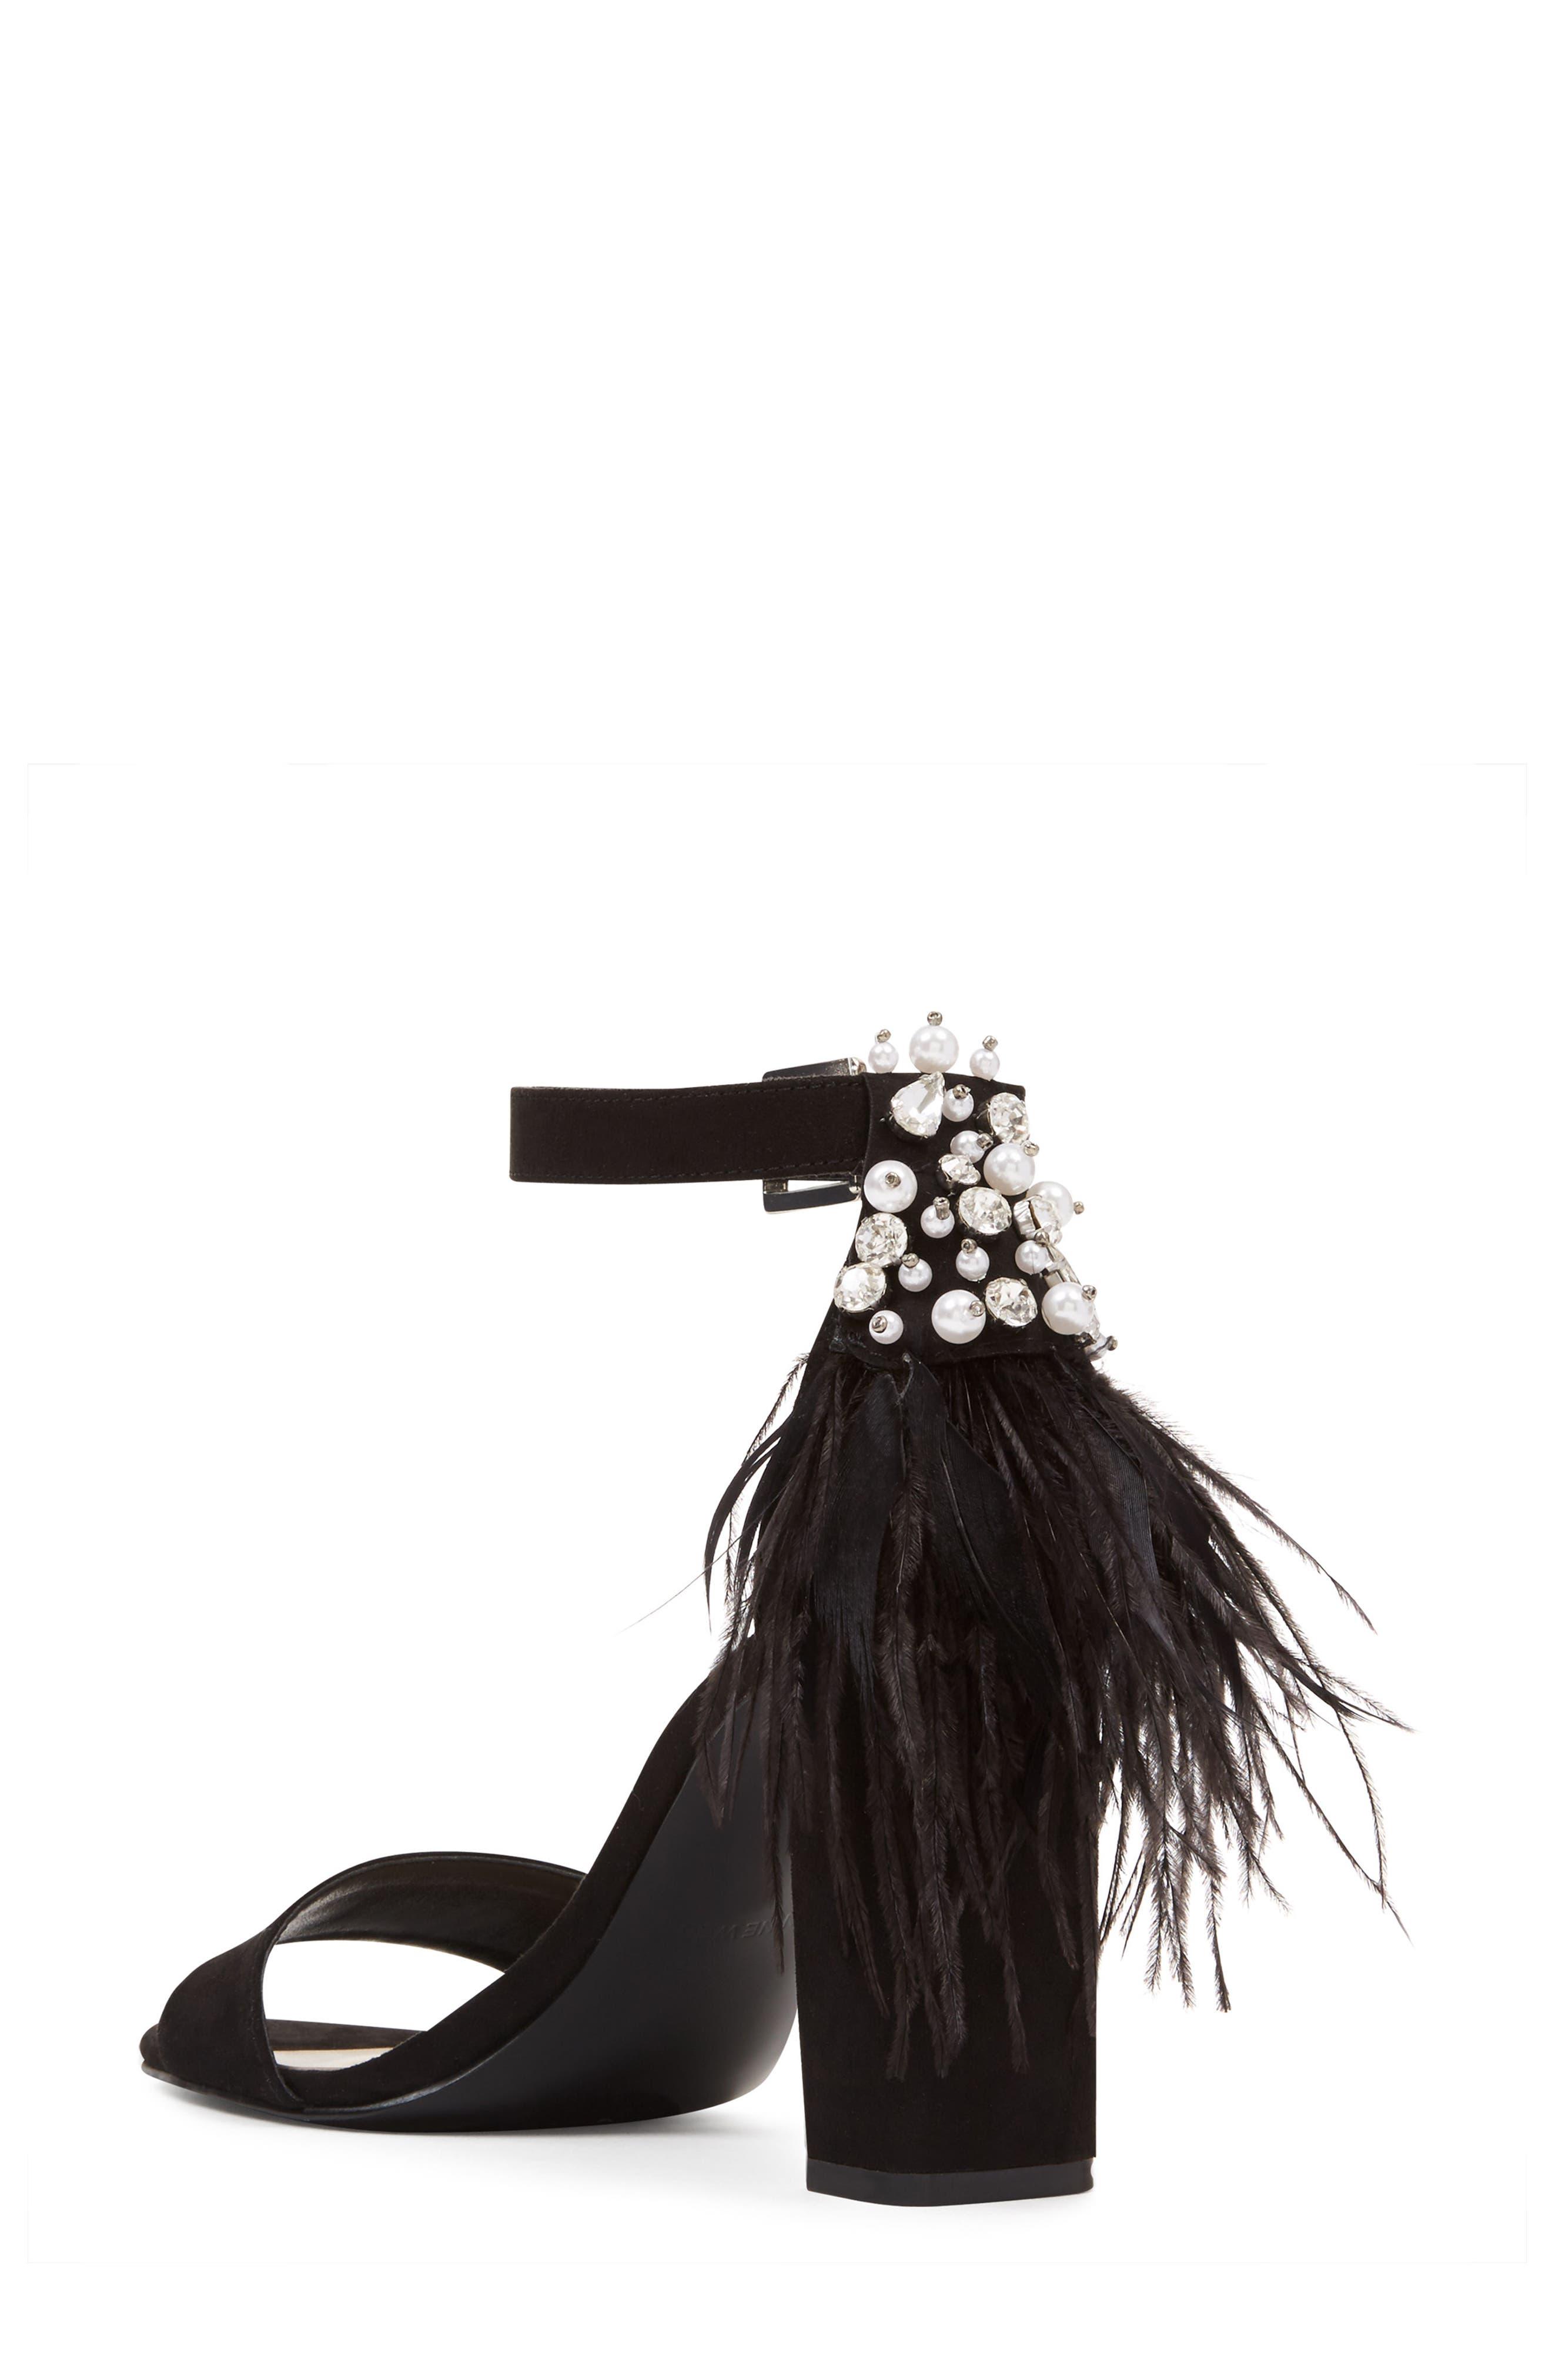 Aaronita Feather Block Heel Sandal,                             Alternate thumbnail 2, color,                             001